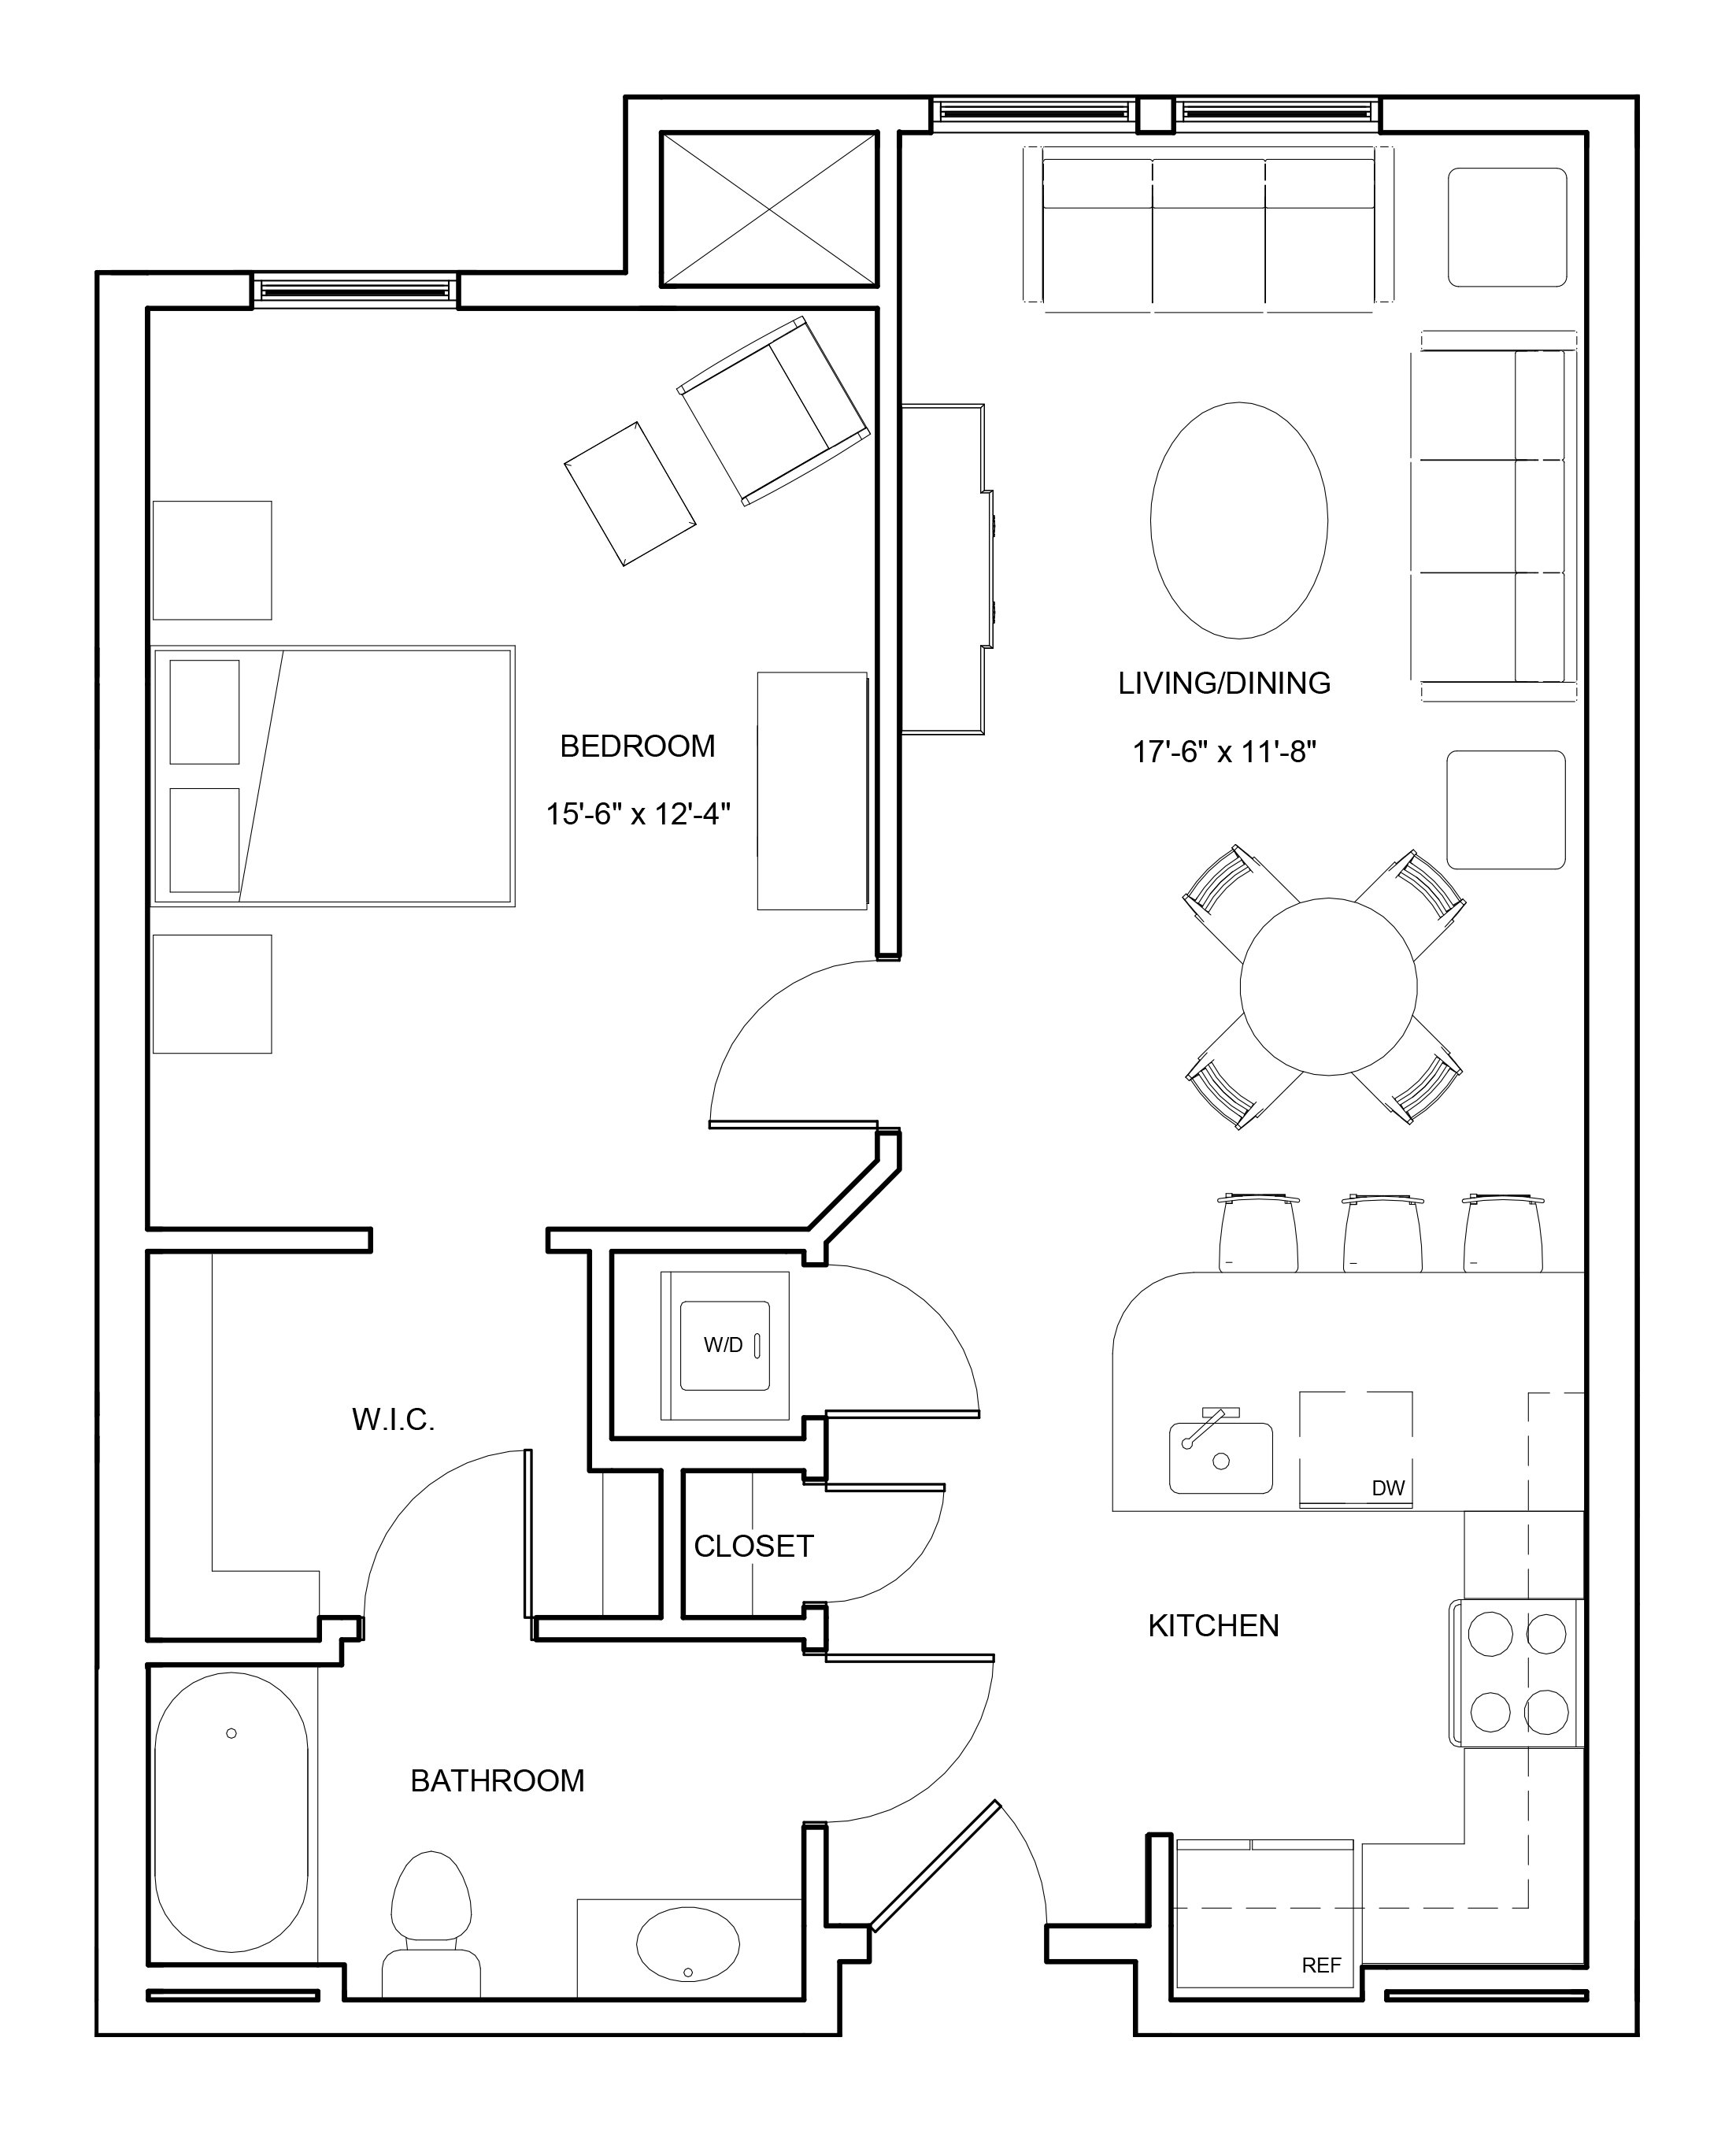 P0663804 a1 2 floorplan